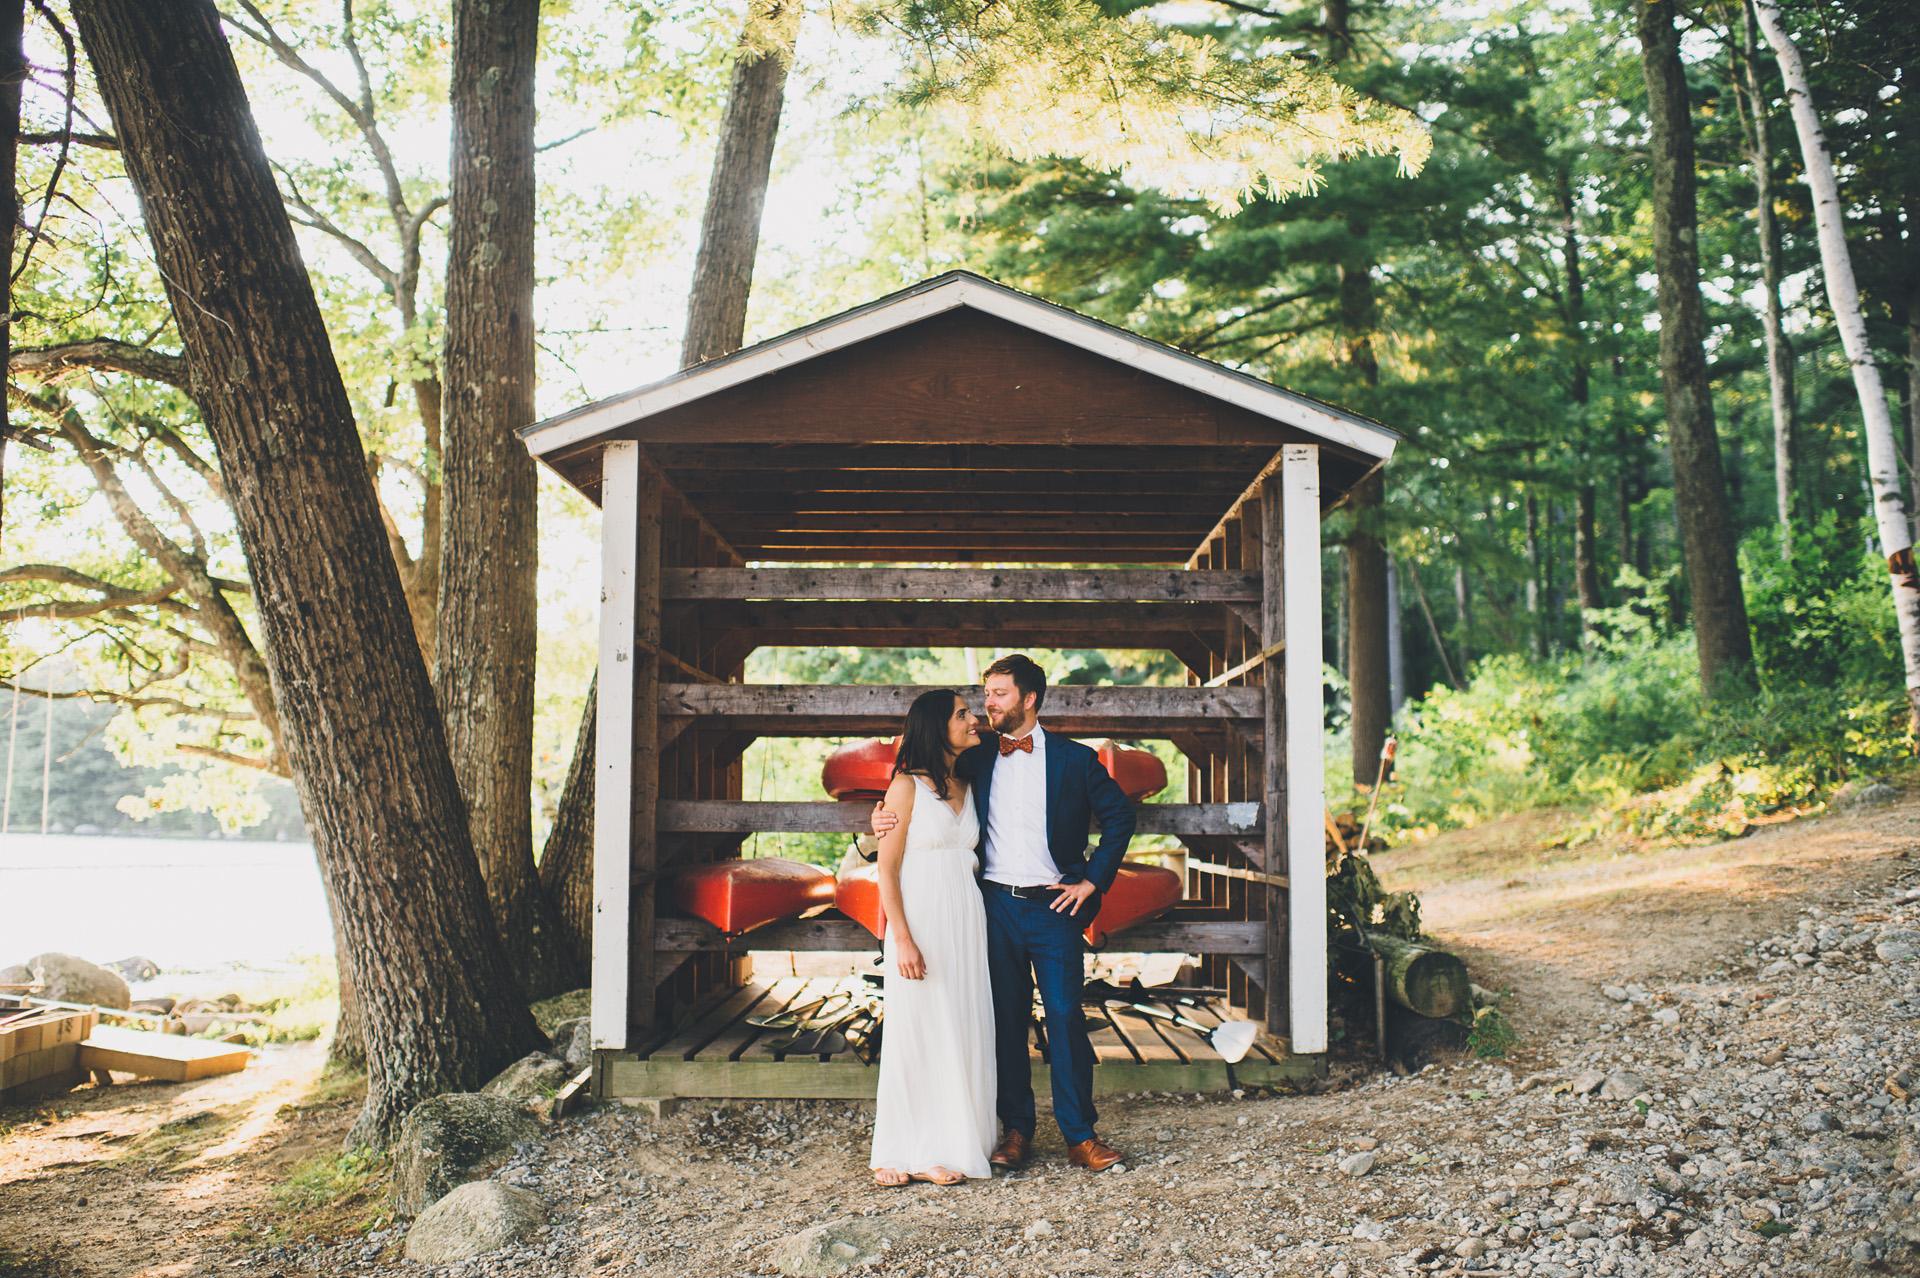 windsor-mountain-summer-camp-wedding-393